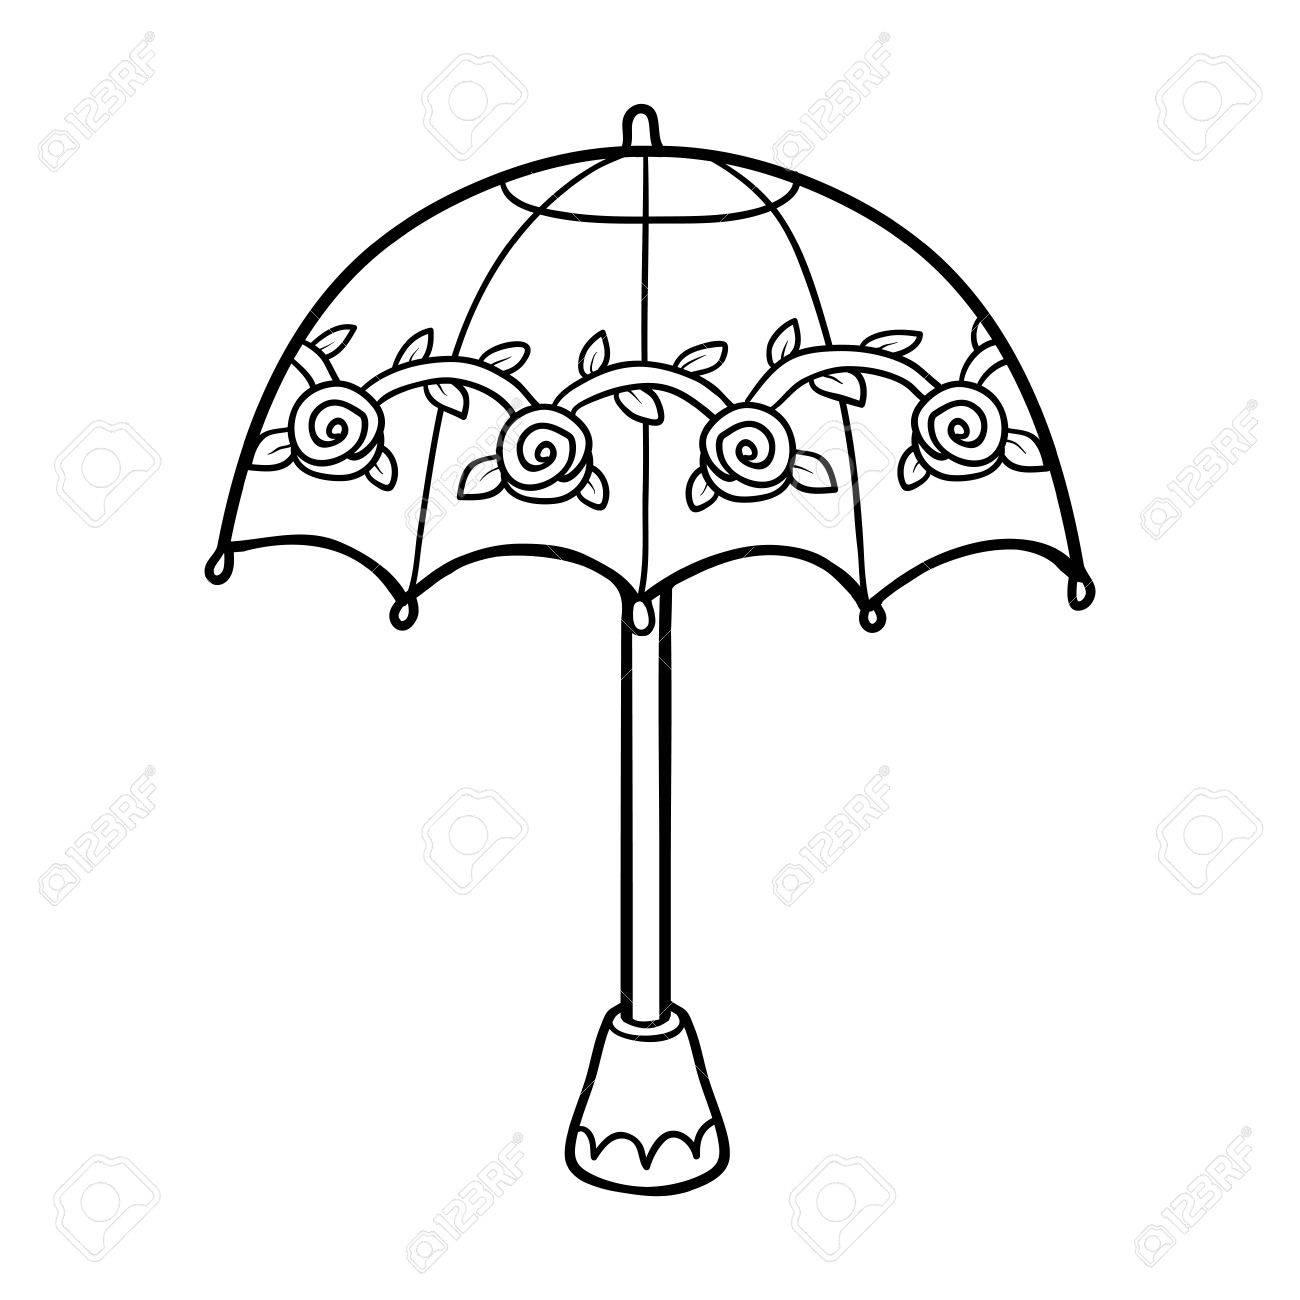 Coloring Book For Children Cute Umbrella